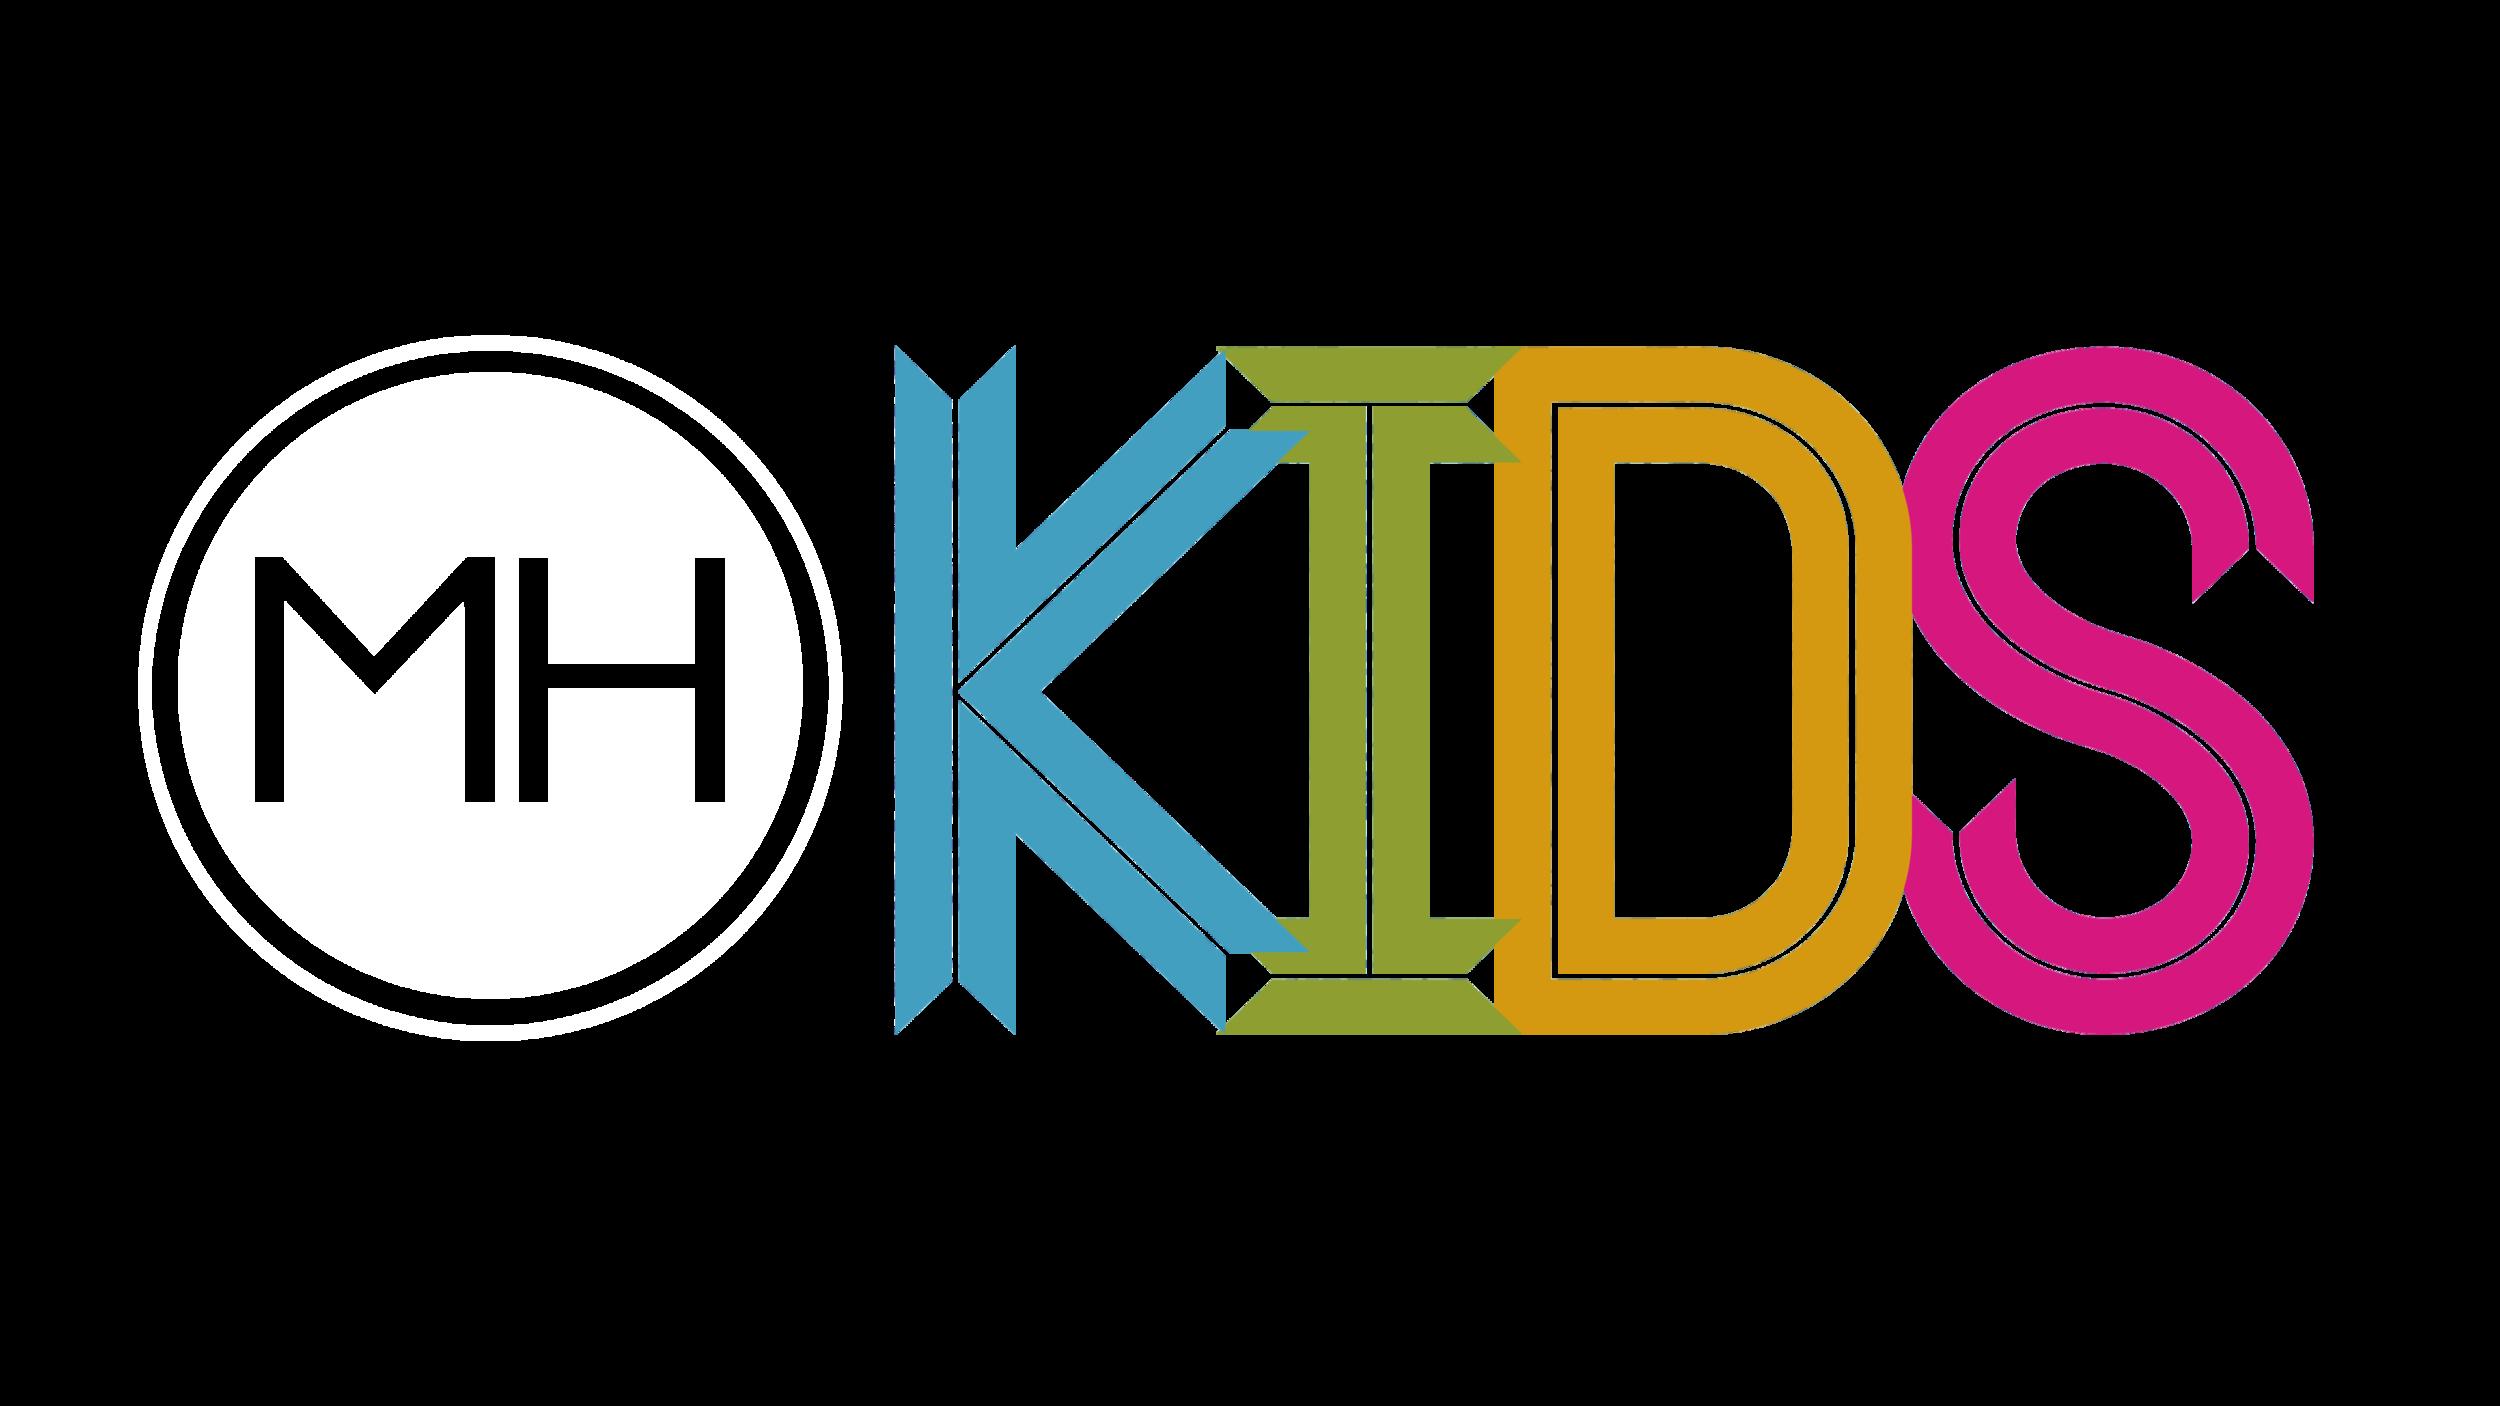 MH kids logo